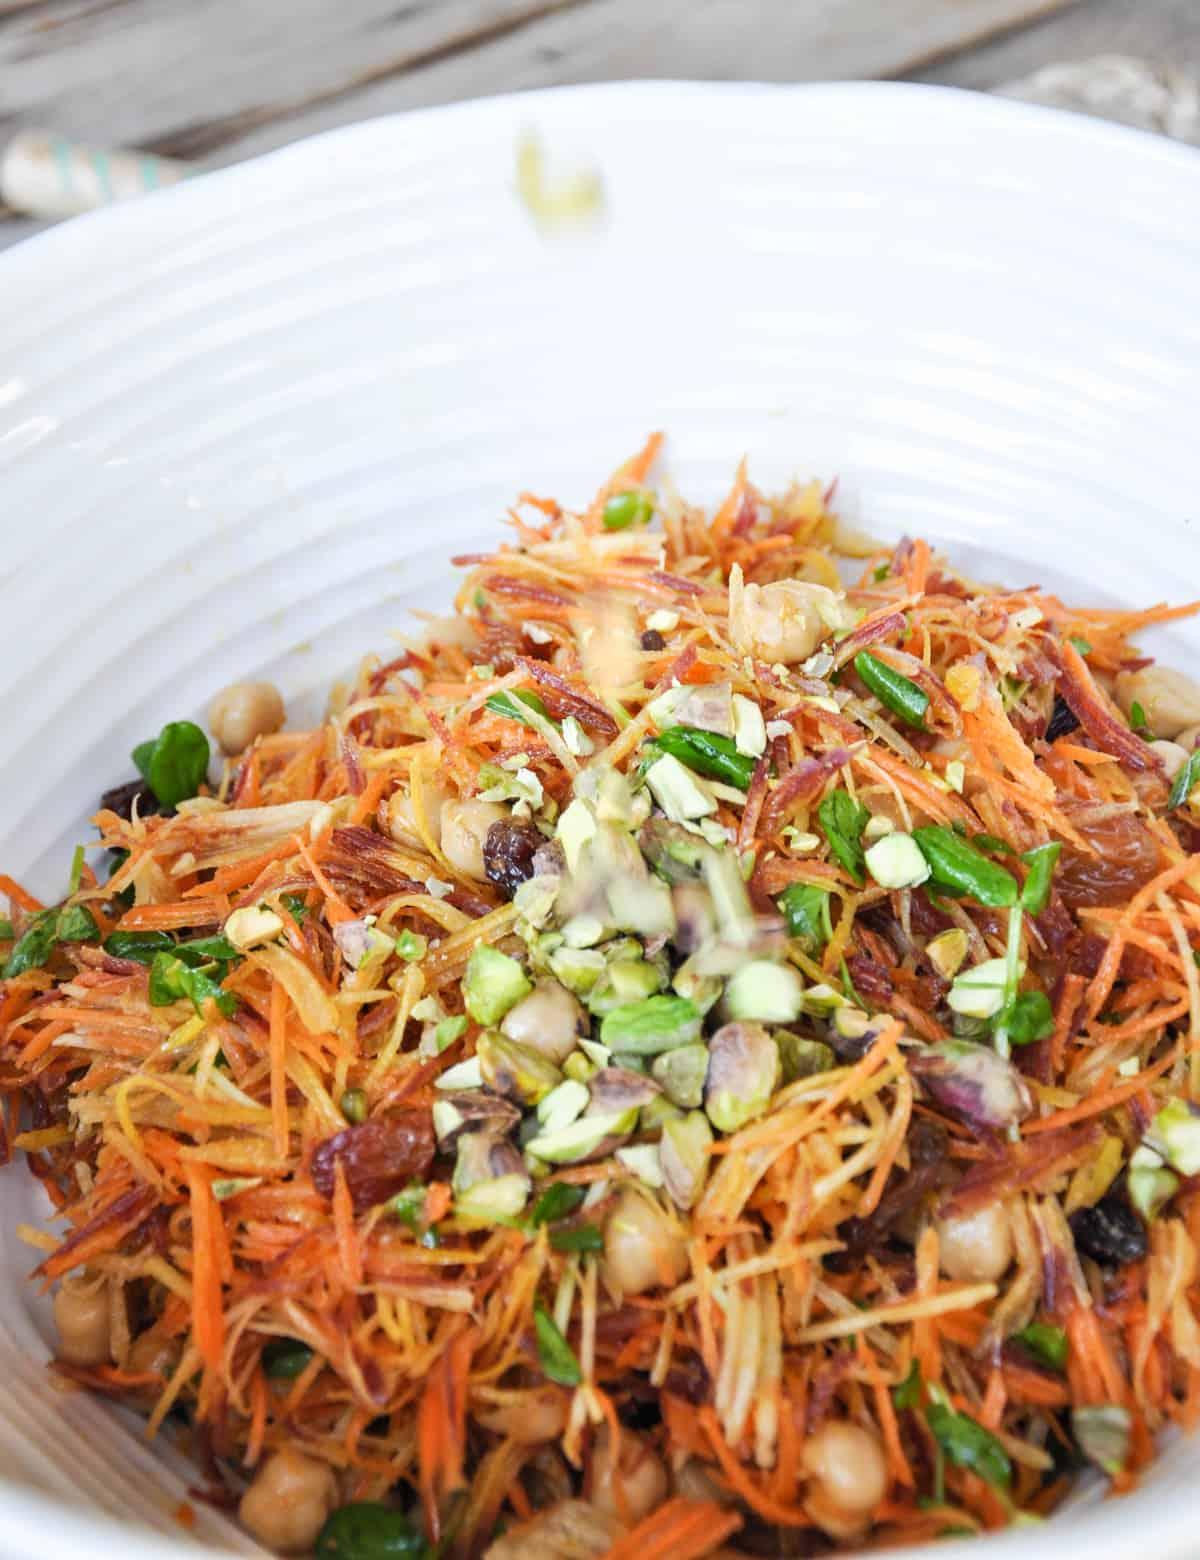 Sunshine Salad using Tri-Color Carrots with garbanzo beans, crimson raisins, pea shoots, feta cheese and pistachios. Holy yum!